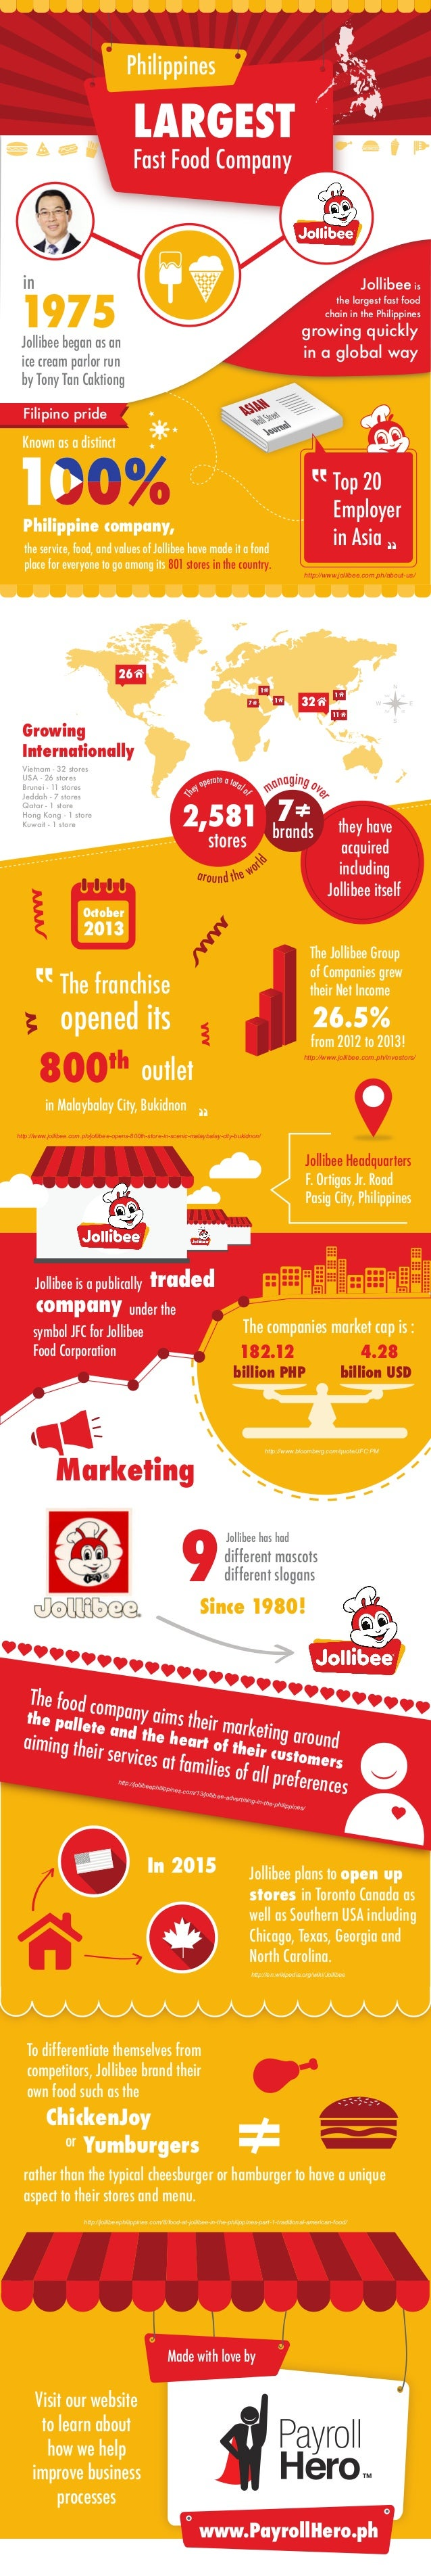 Growing Internationally Vietnam - 32 stores USA - 26 stores Brunei - 11 stores Jeddah - 7 stores Qatar - 1 store Hong Kong...